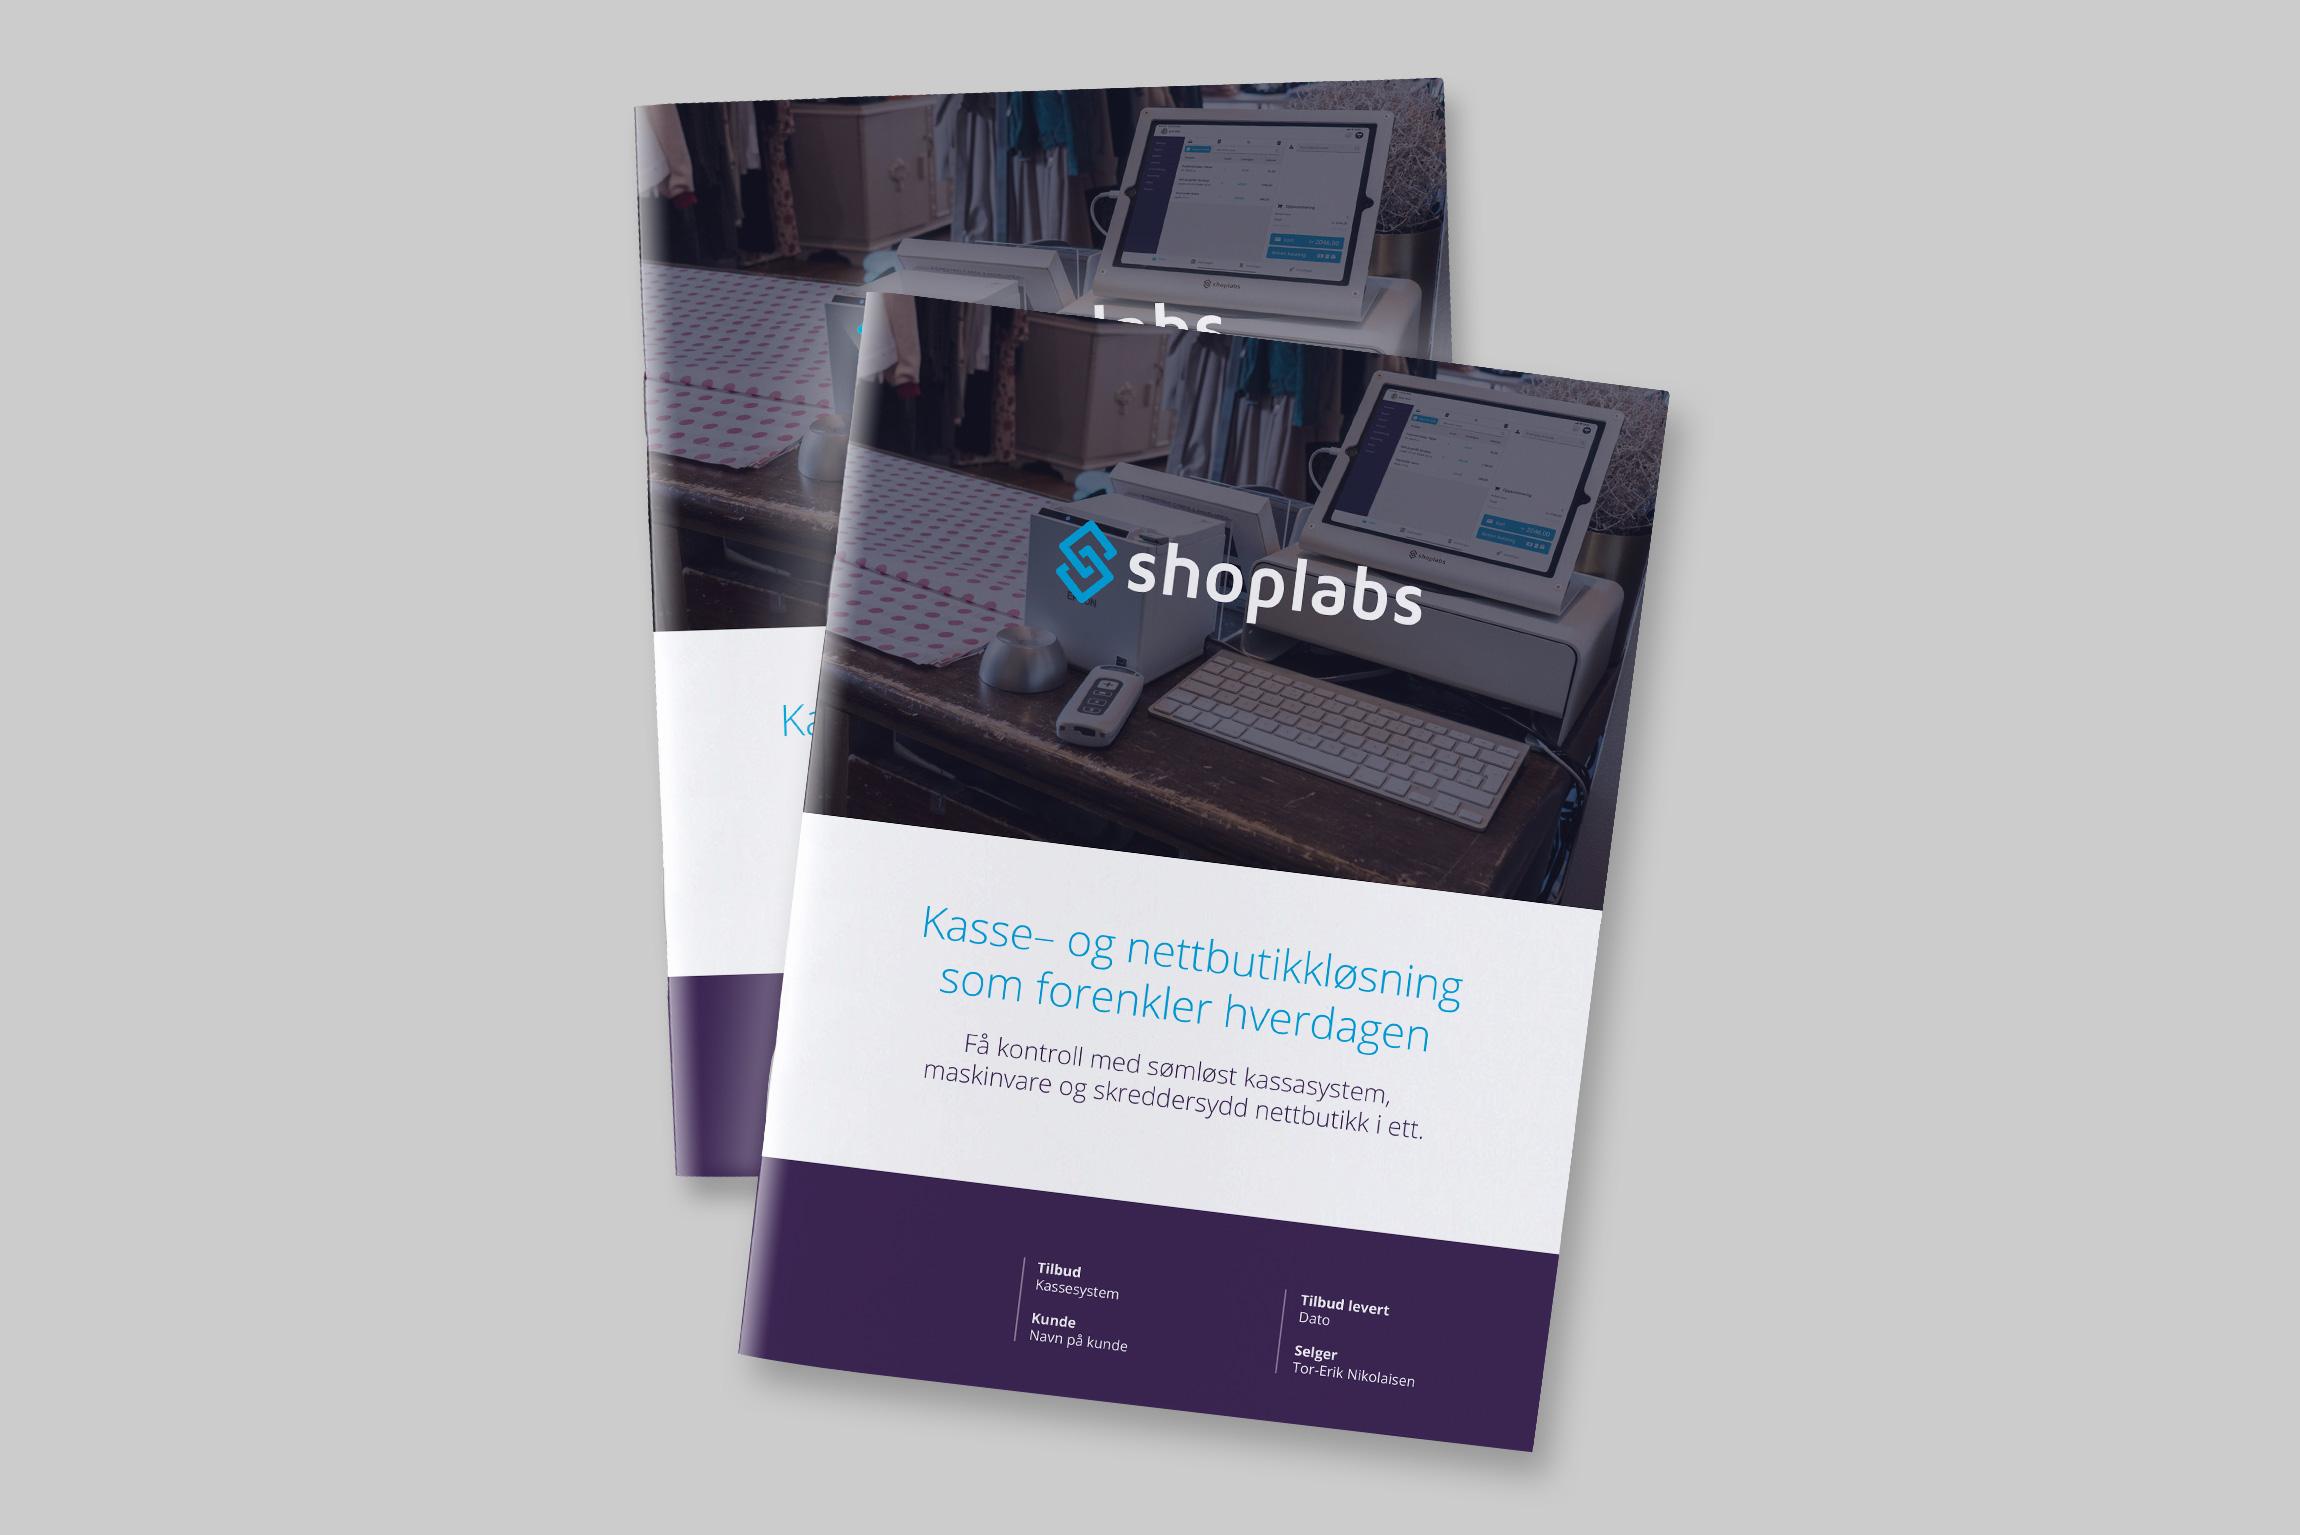 Shoplabs-tilbud.jpg